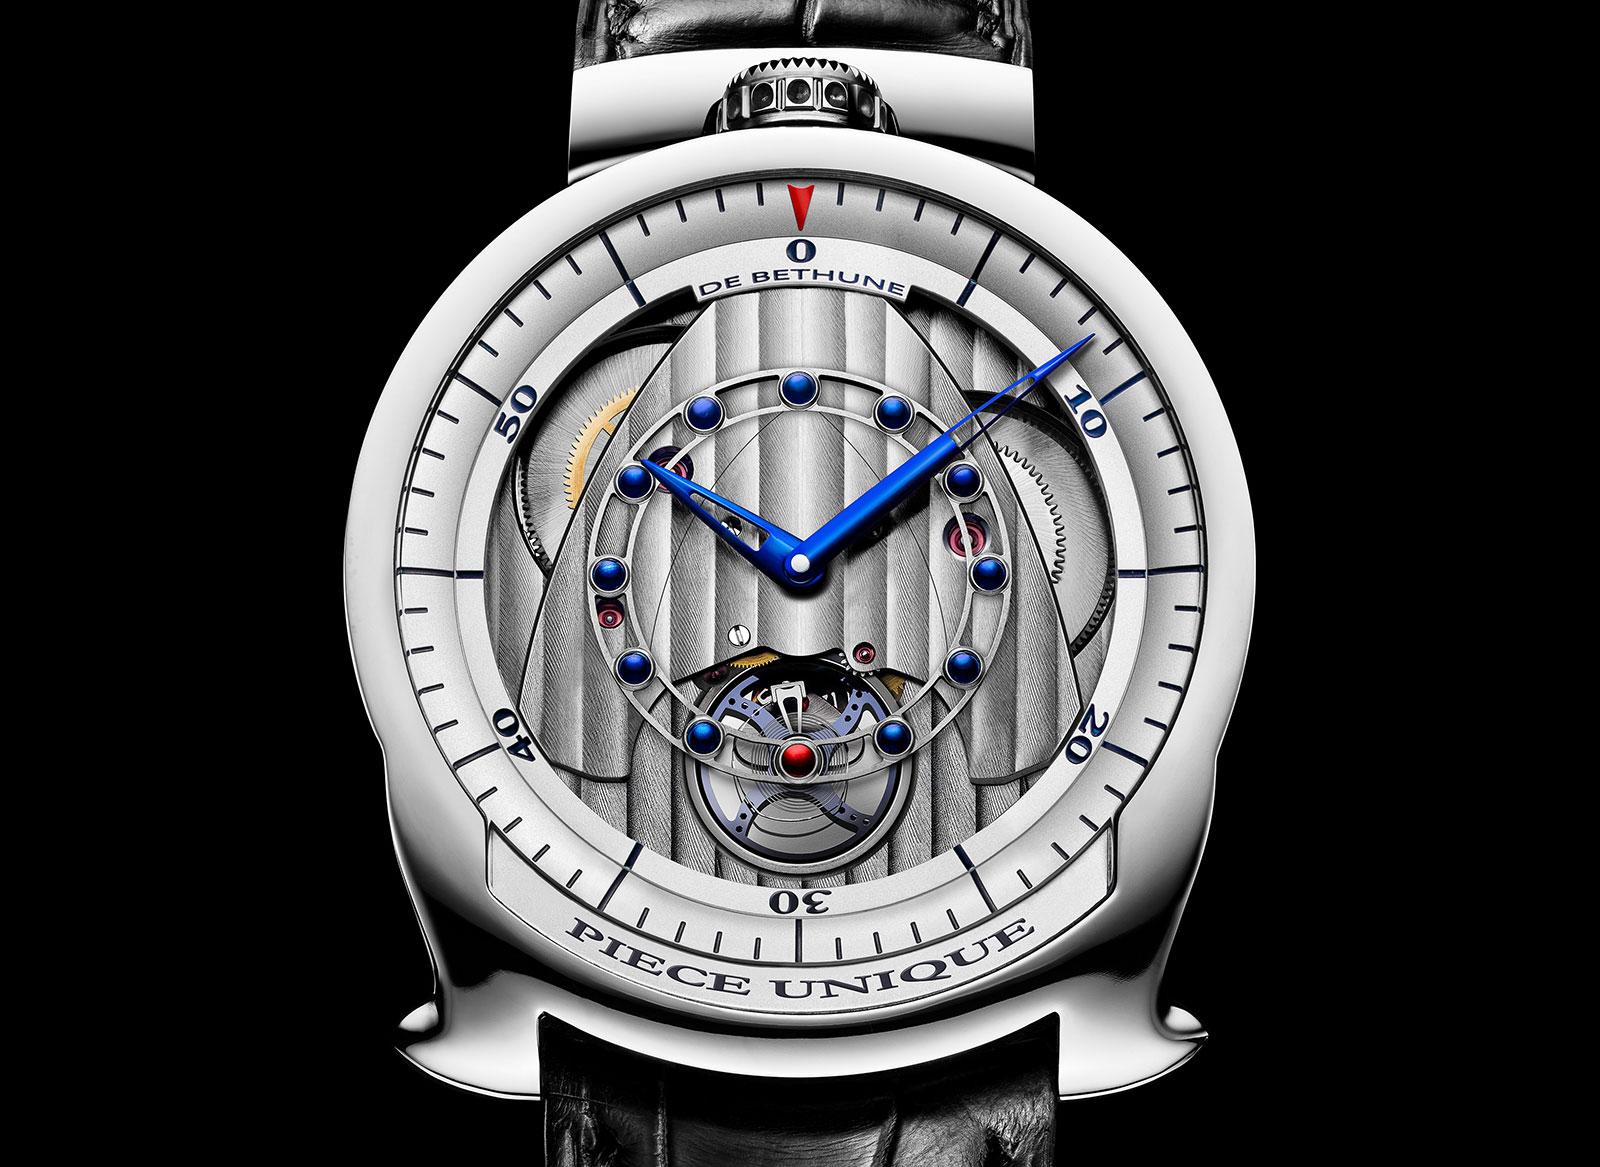 De-Bethune-DBS-2005-2015-Only-Watch-2015-thumb-1600x1167-26696.jpg